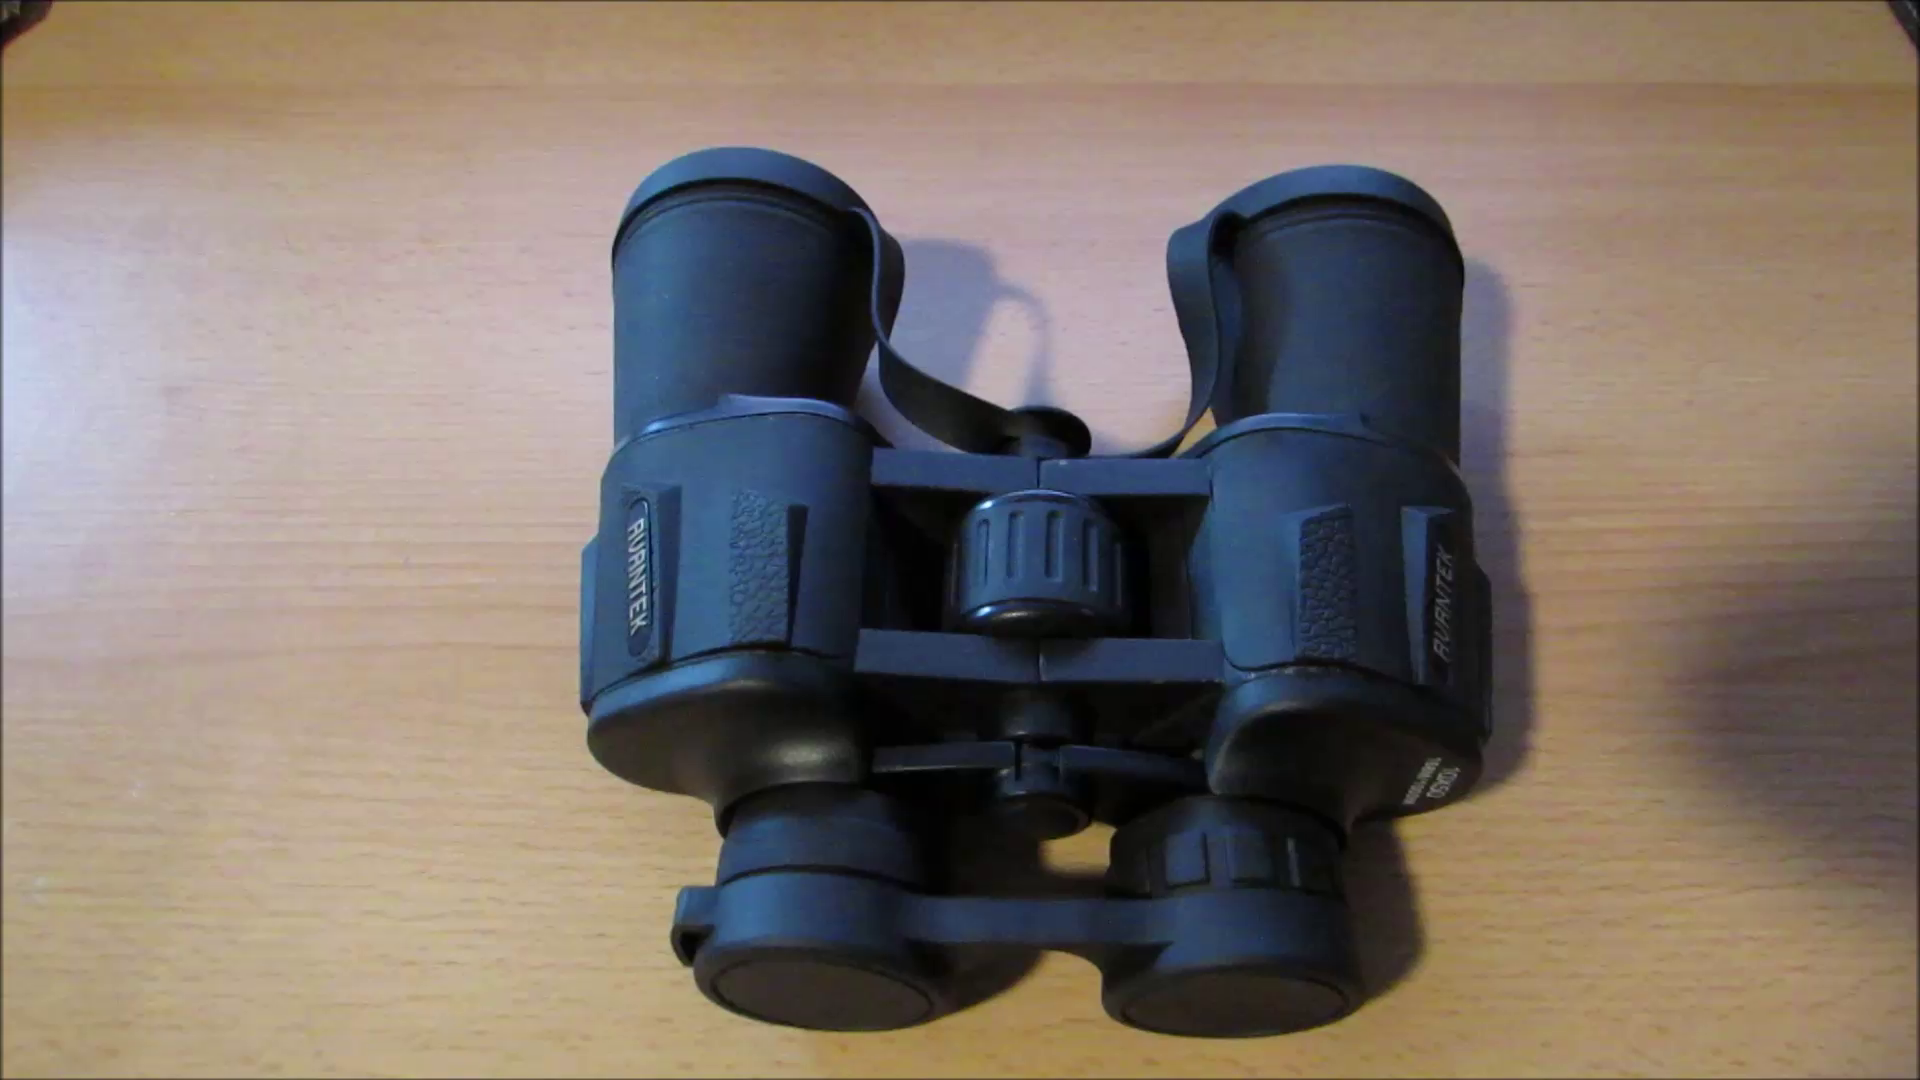 Fernglas avantek binocular mit bak prismen amazon